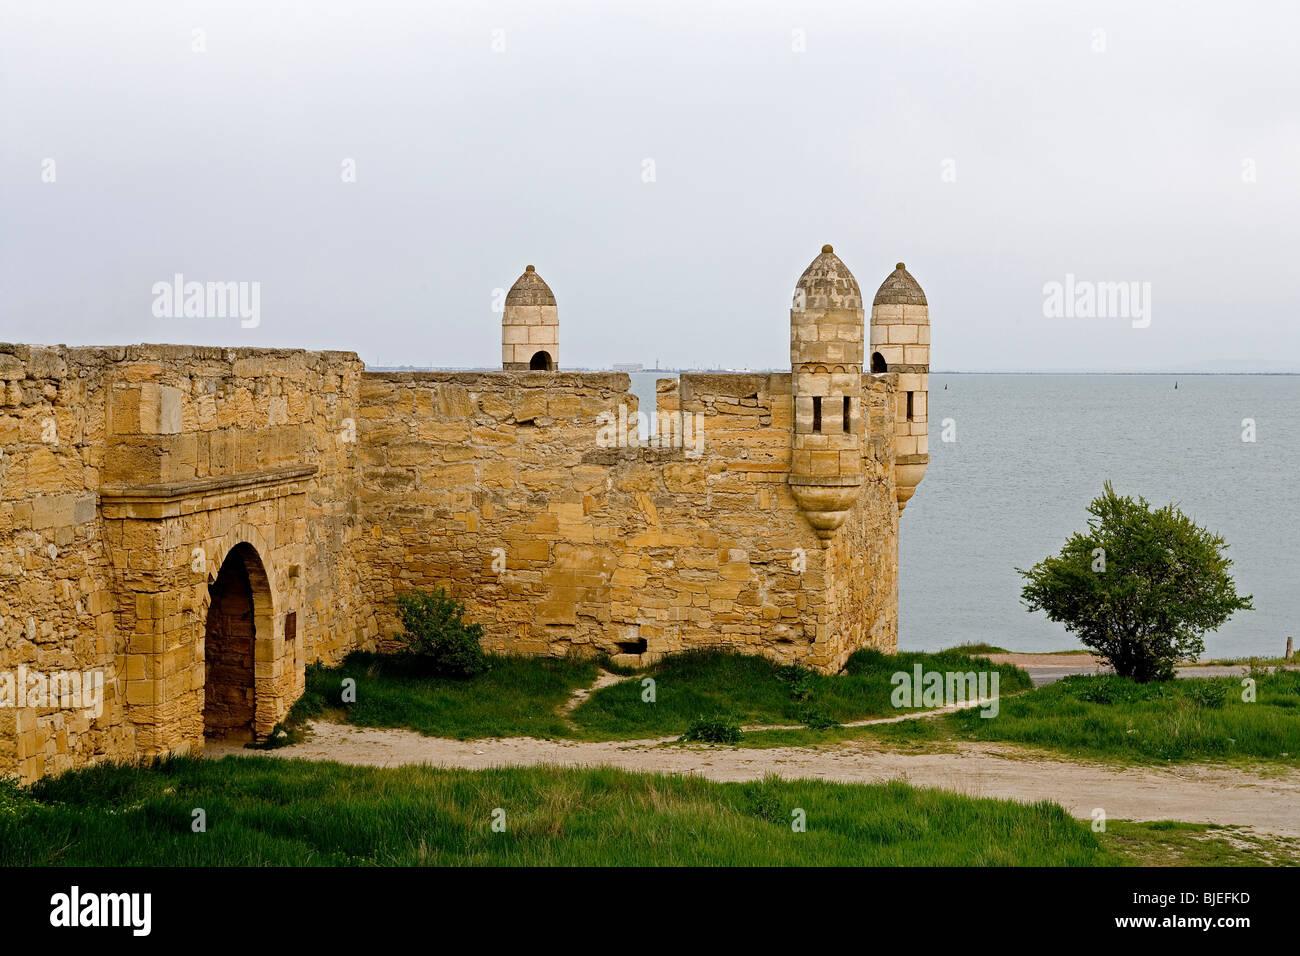 Ukraine,Crimea,Kerch,Yeni-Kale Fortress,1703 - Stock Image